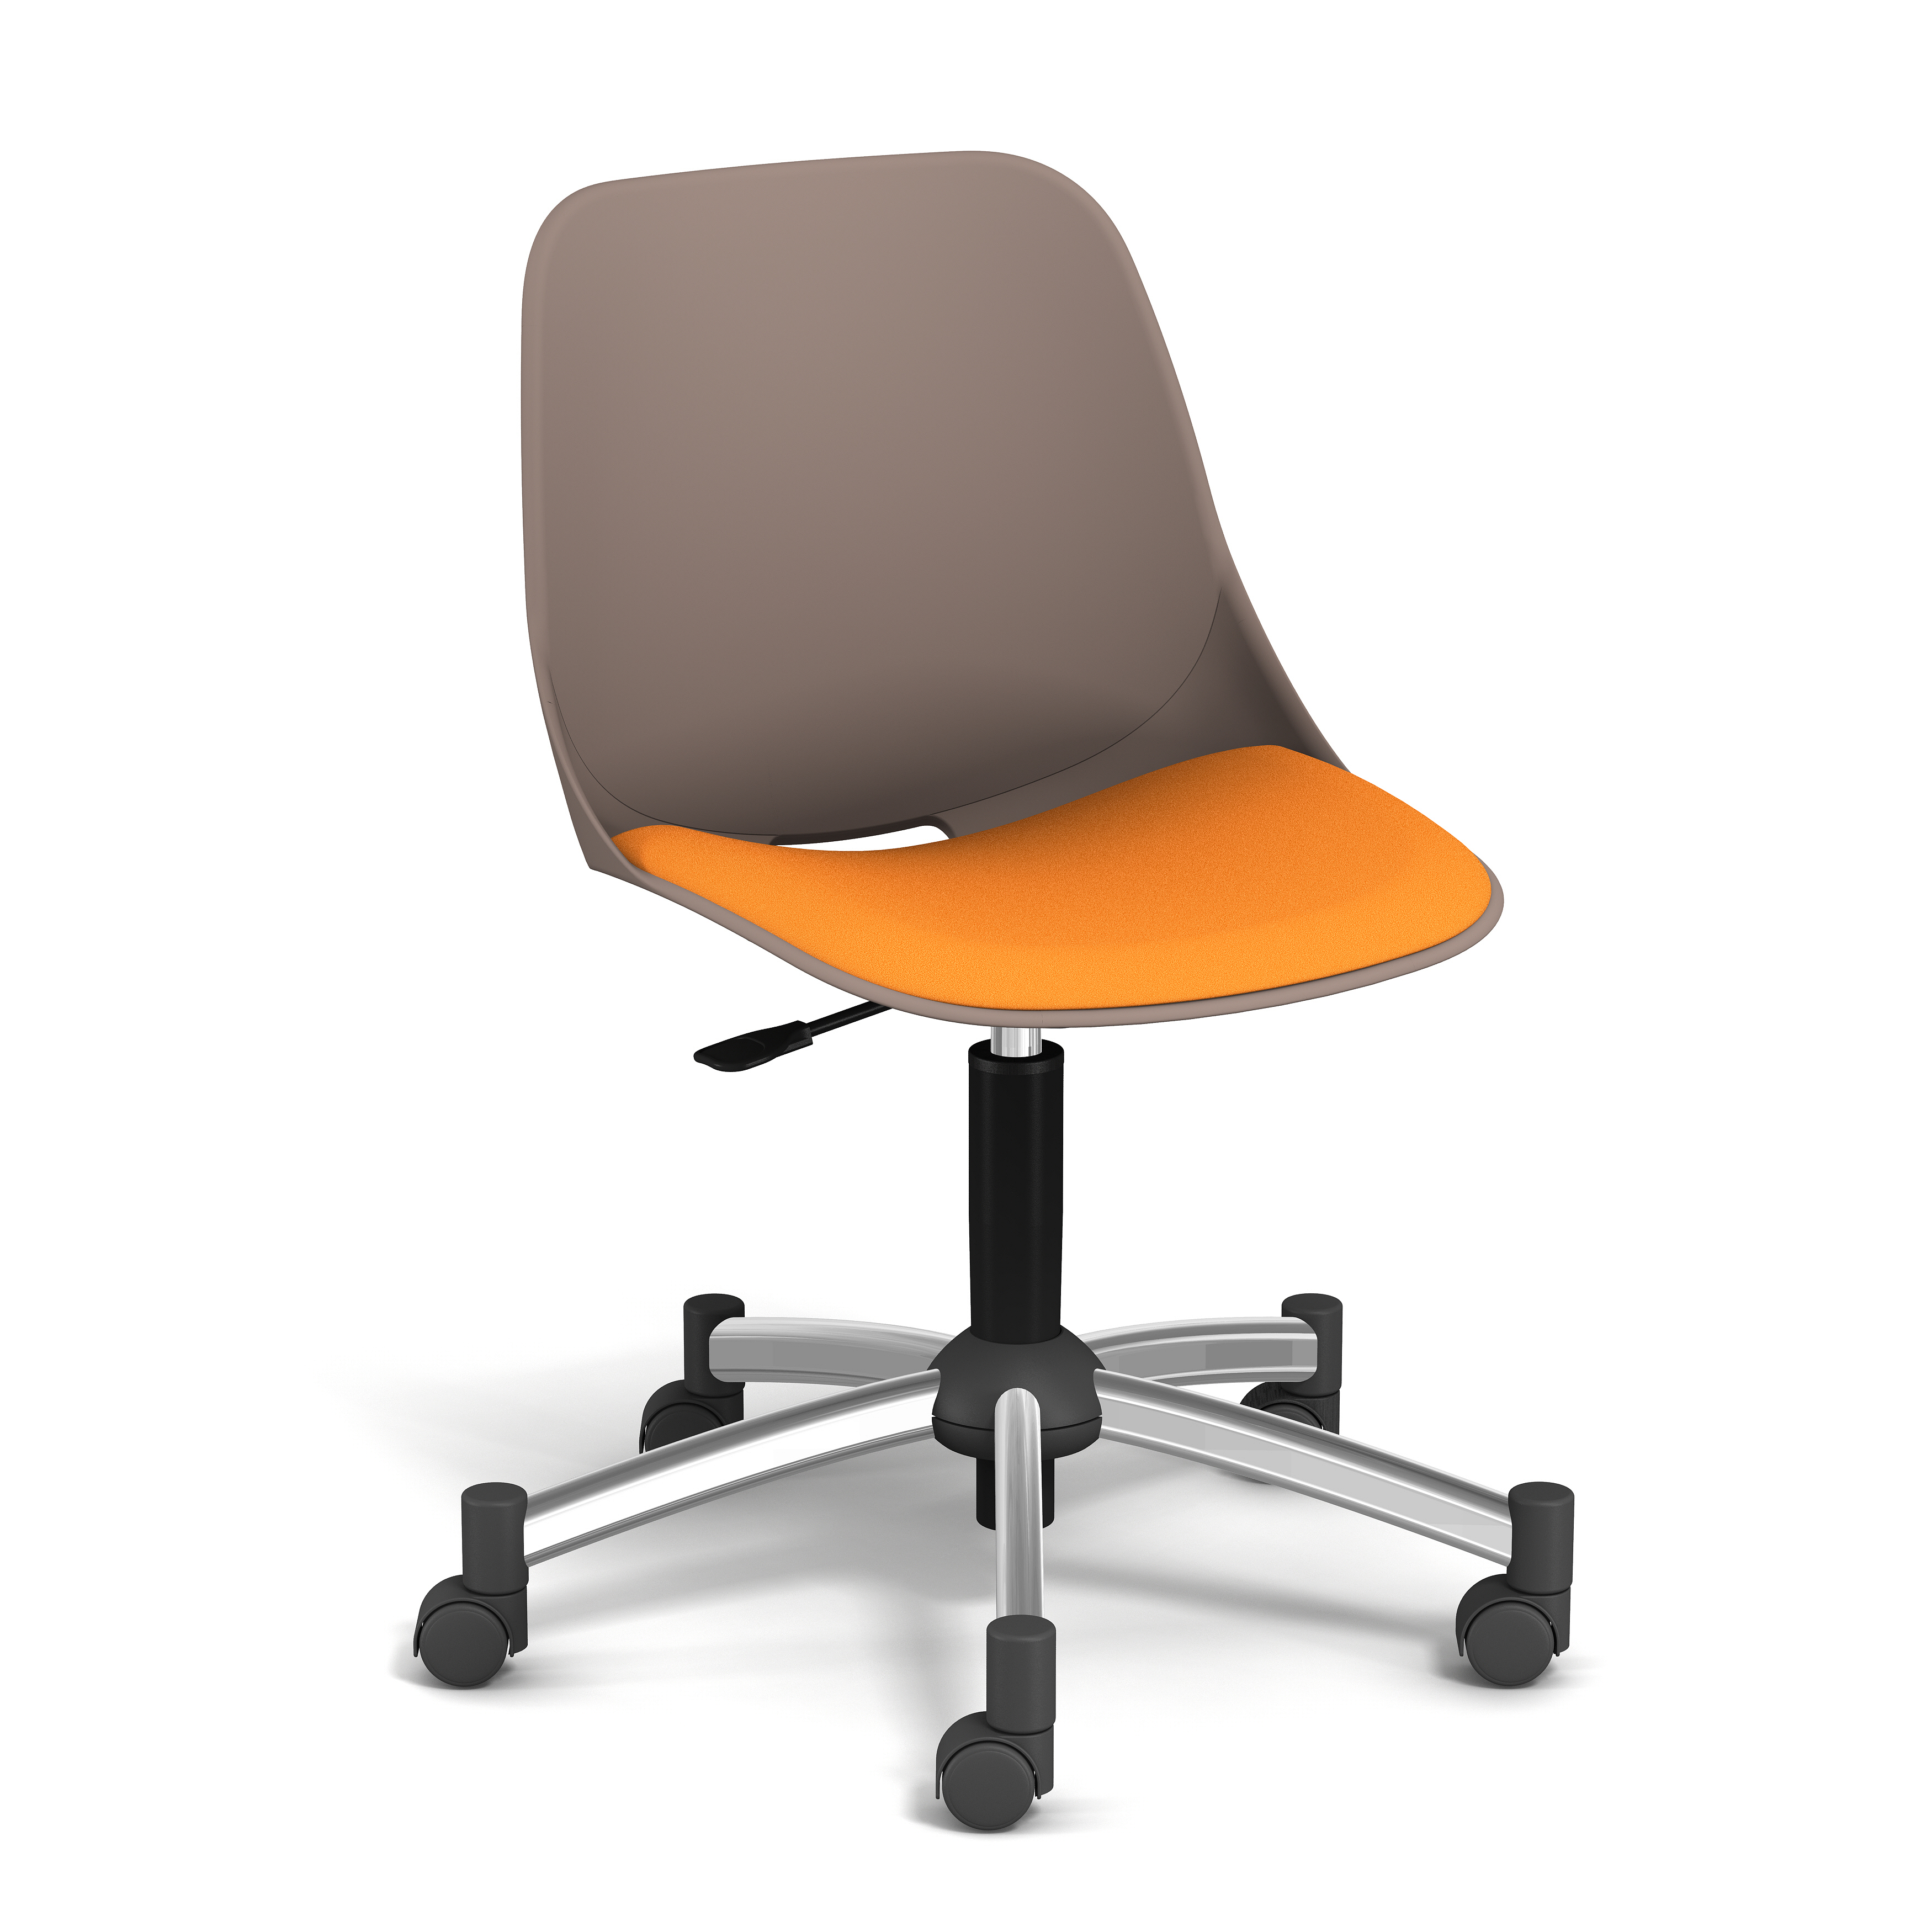 Chaise PALM - coque taupe - assise mandarine - base chromé